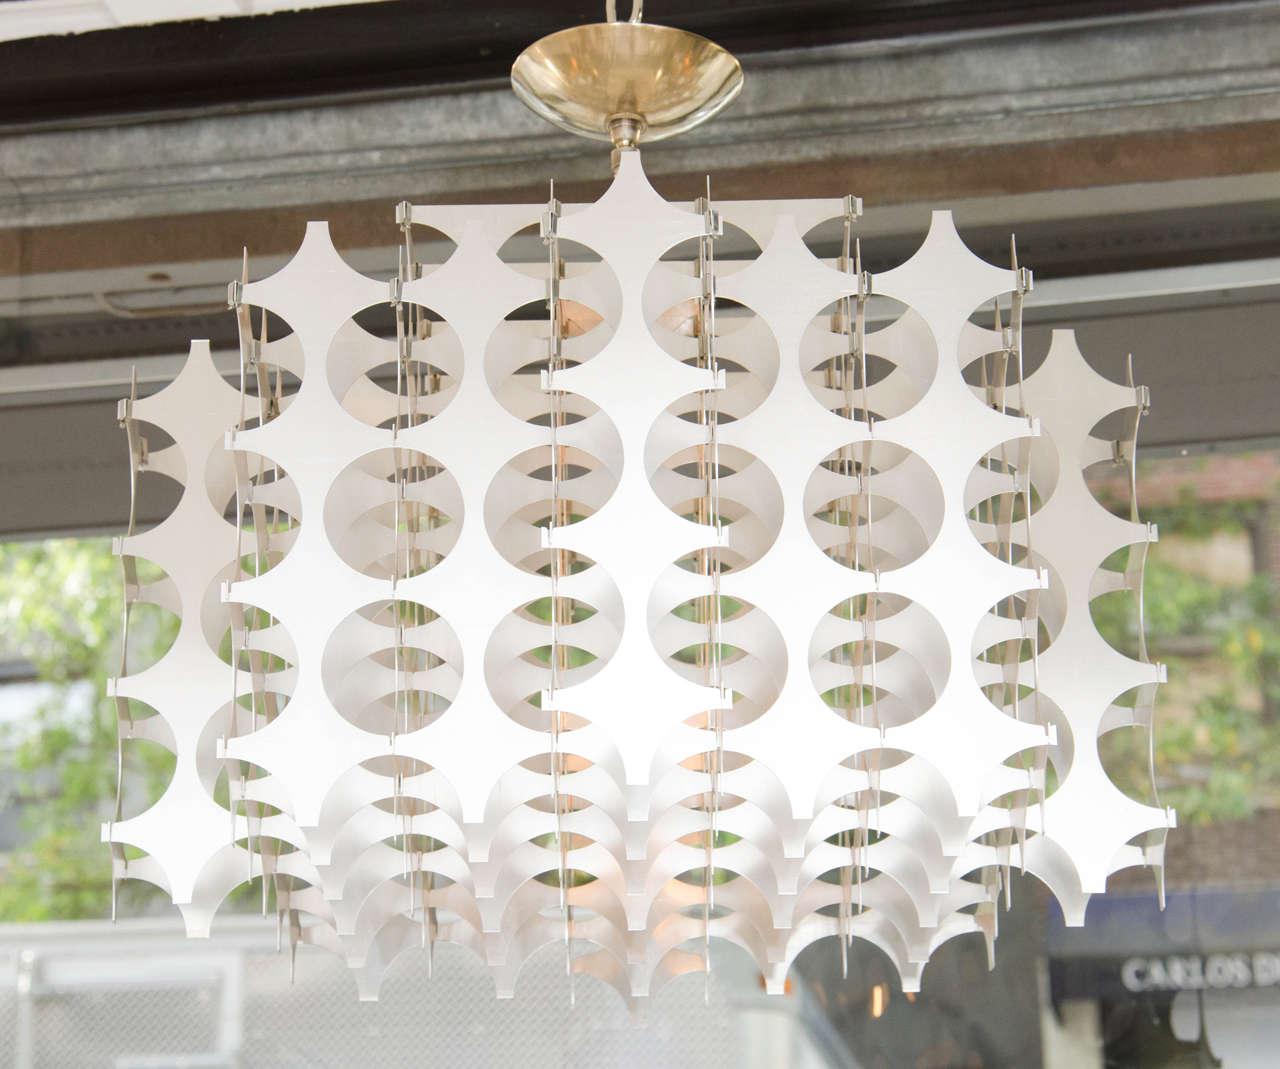 Geometric Pierced Aluminum Pendants by Mario Marenco for Artemide For Sale 3